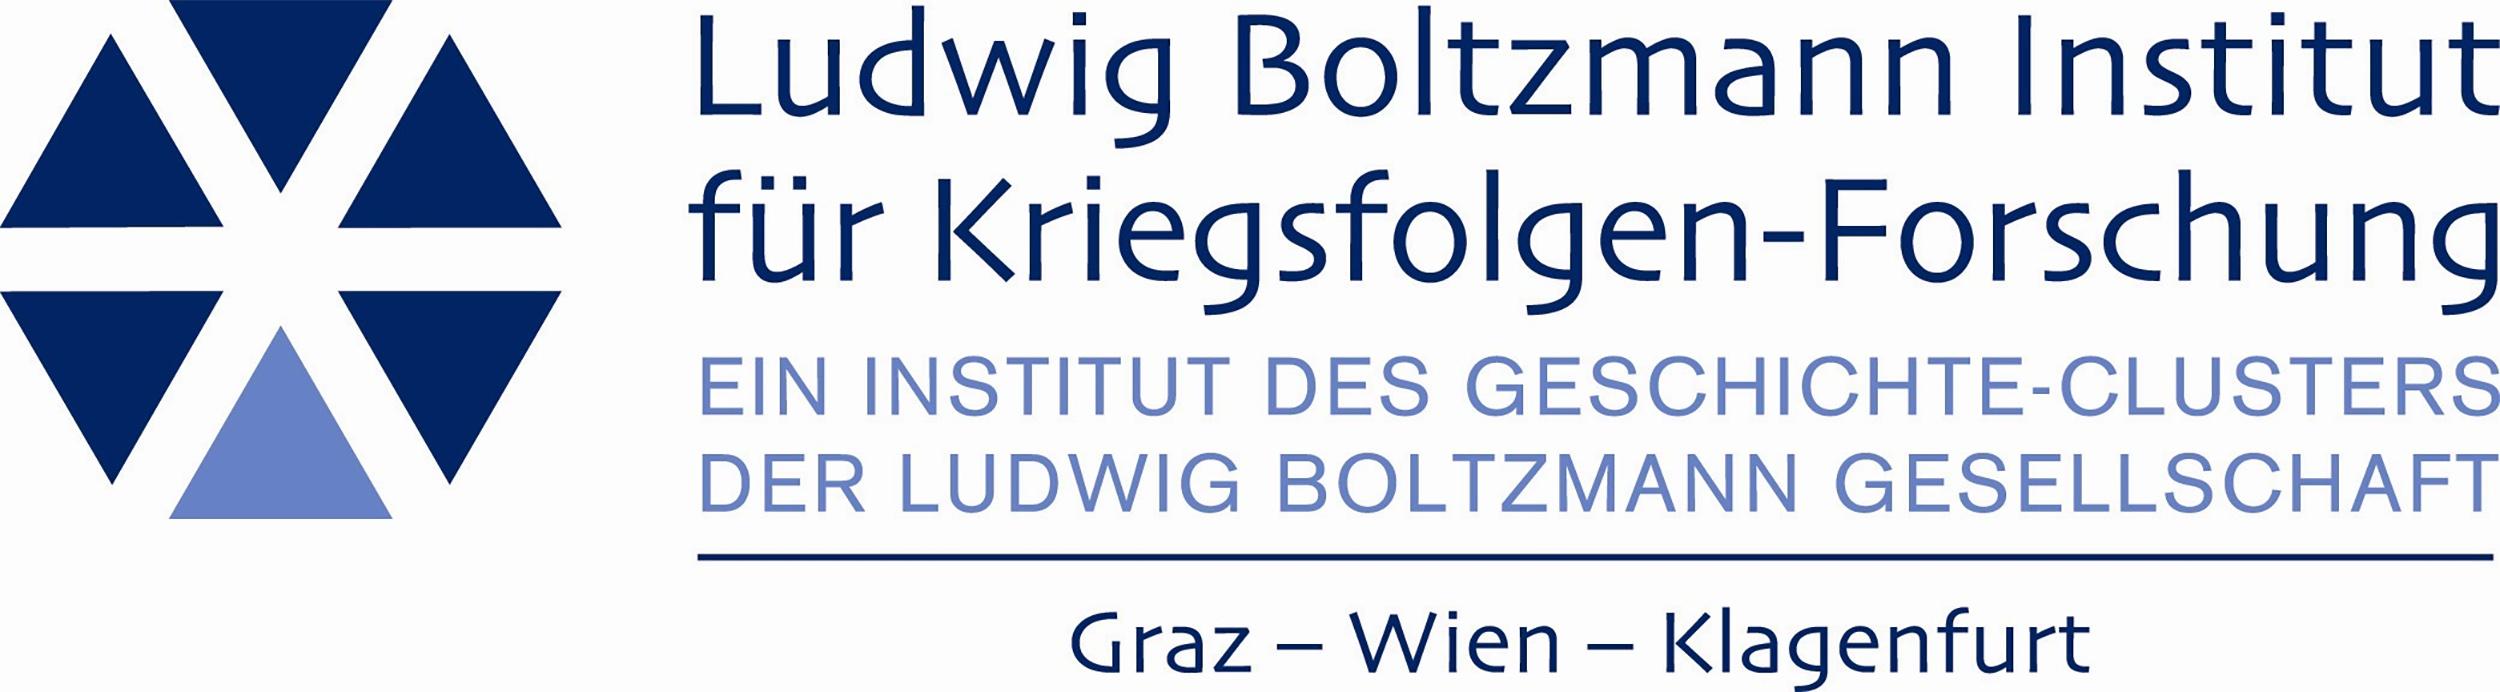 logo_boltzmann.jpg